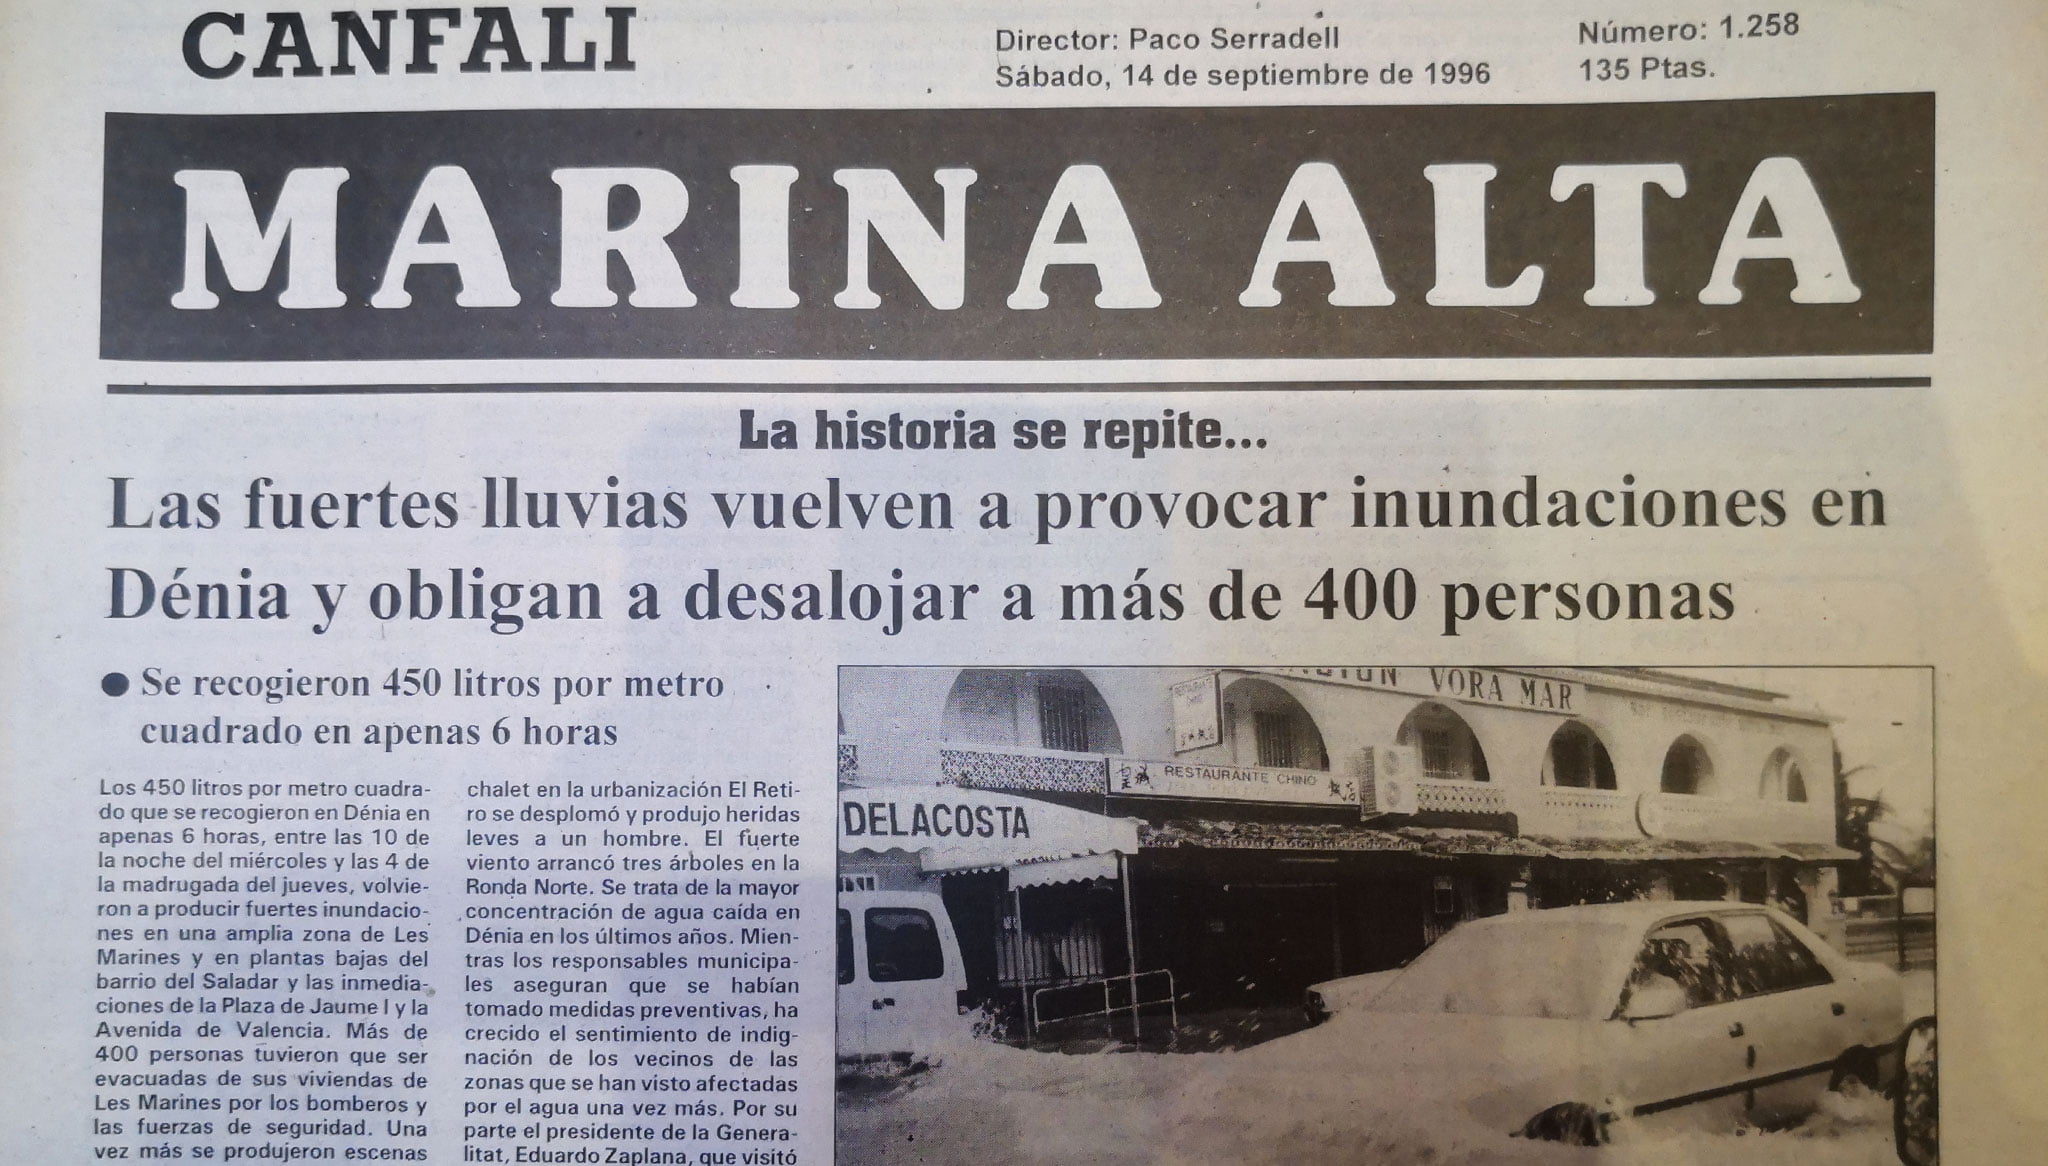 portada-Canfali-1996-inundacions-denia